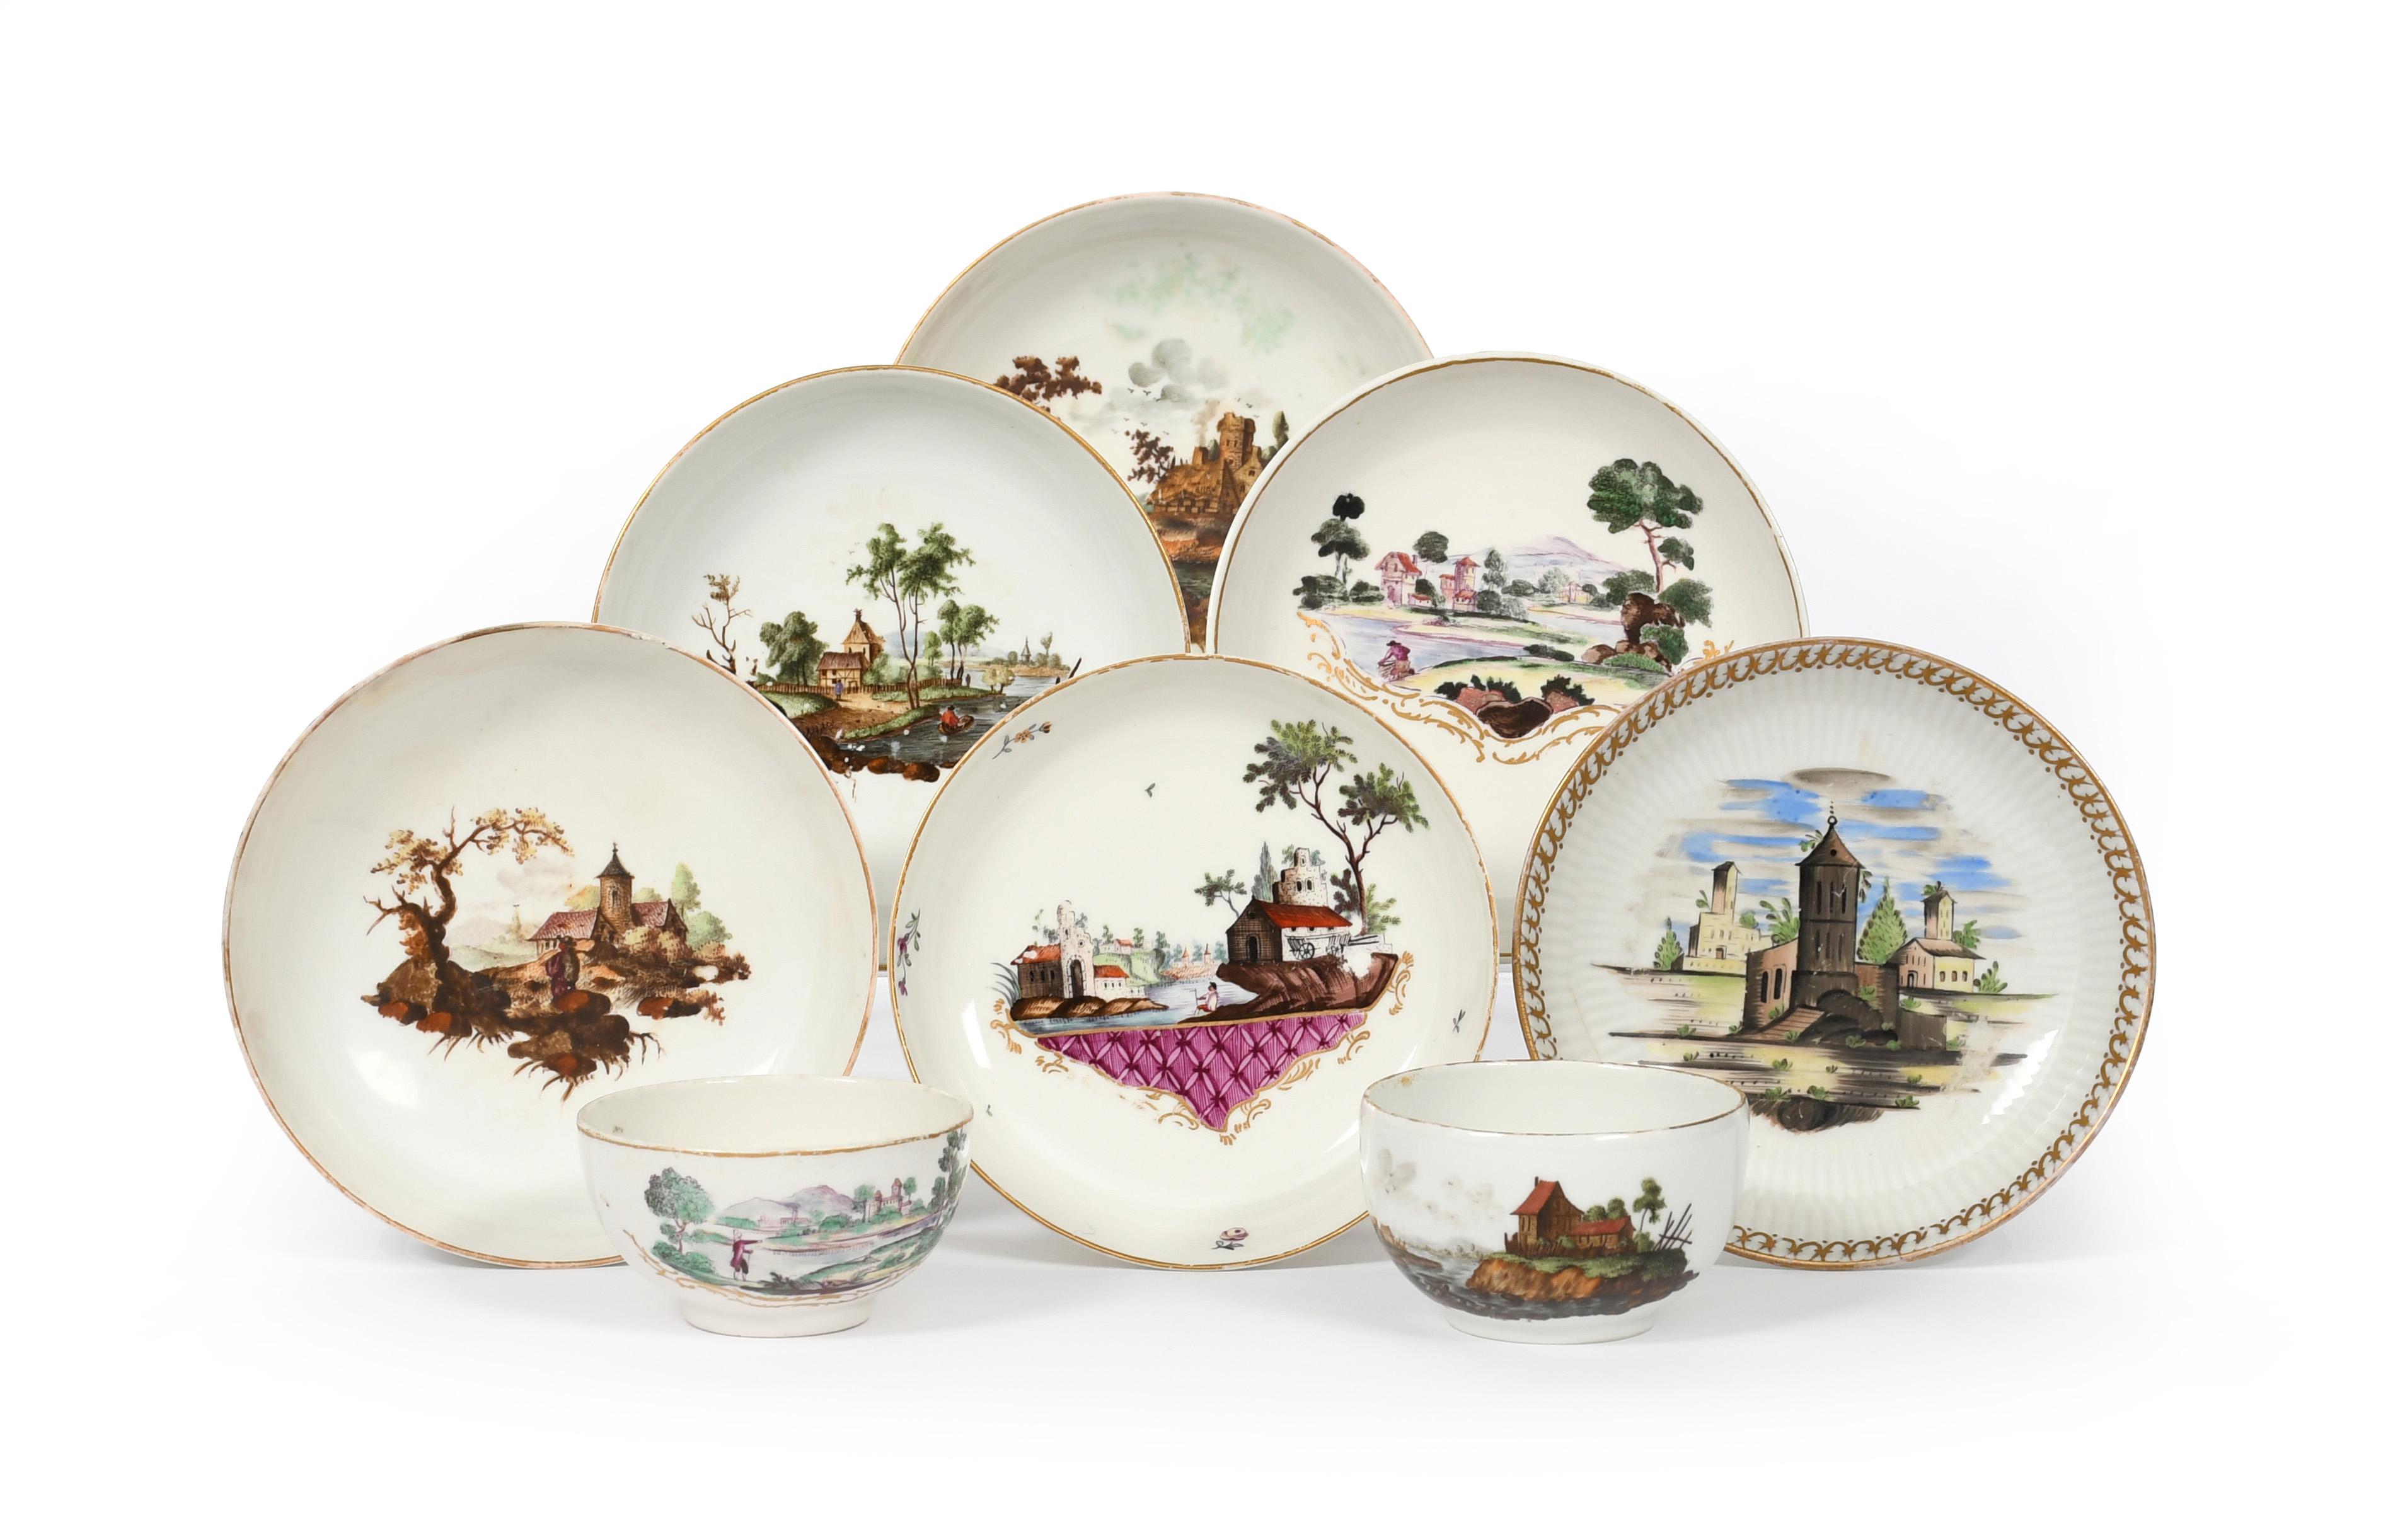 A group of German porcelain teawares c.1760-80, including a Würzburg tea cup and saucer, a